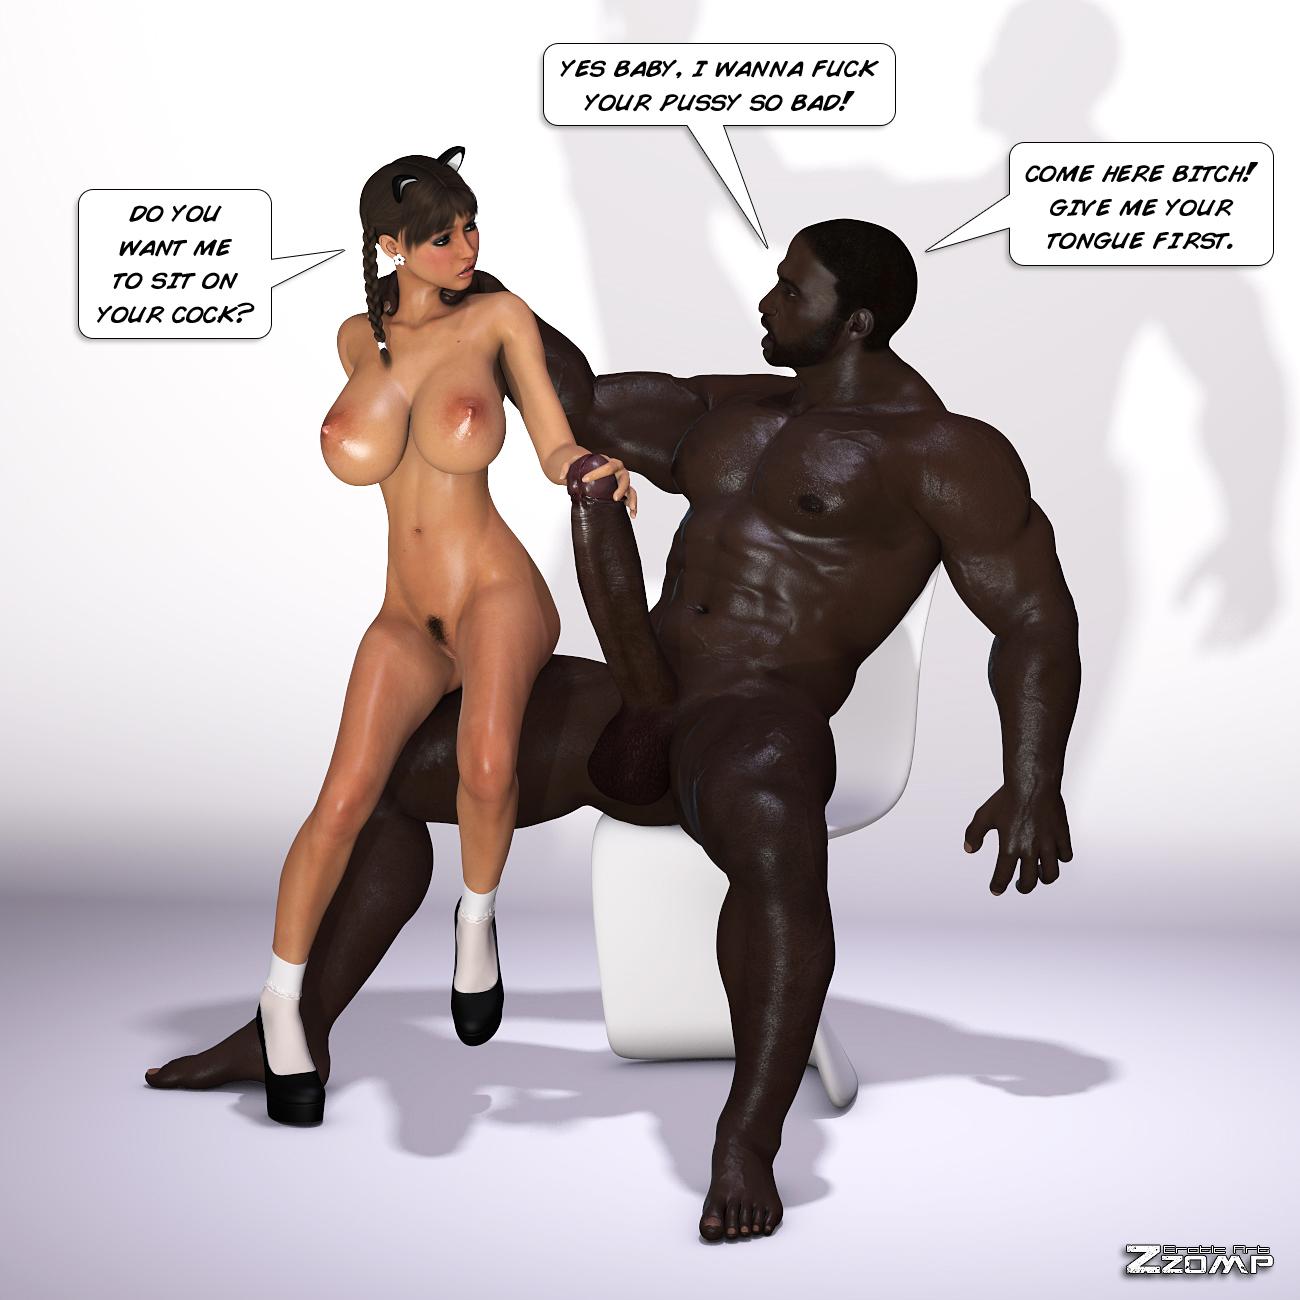 Werewolf masterbating porn pics xxx toons